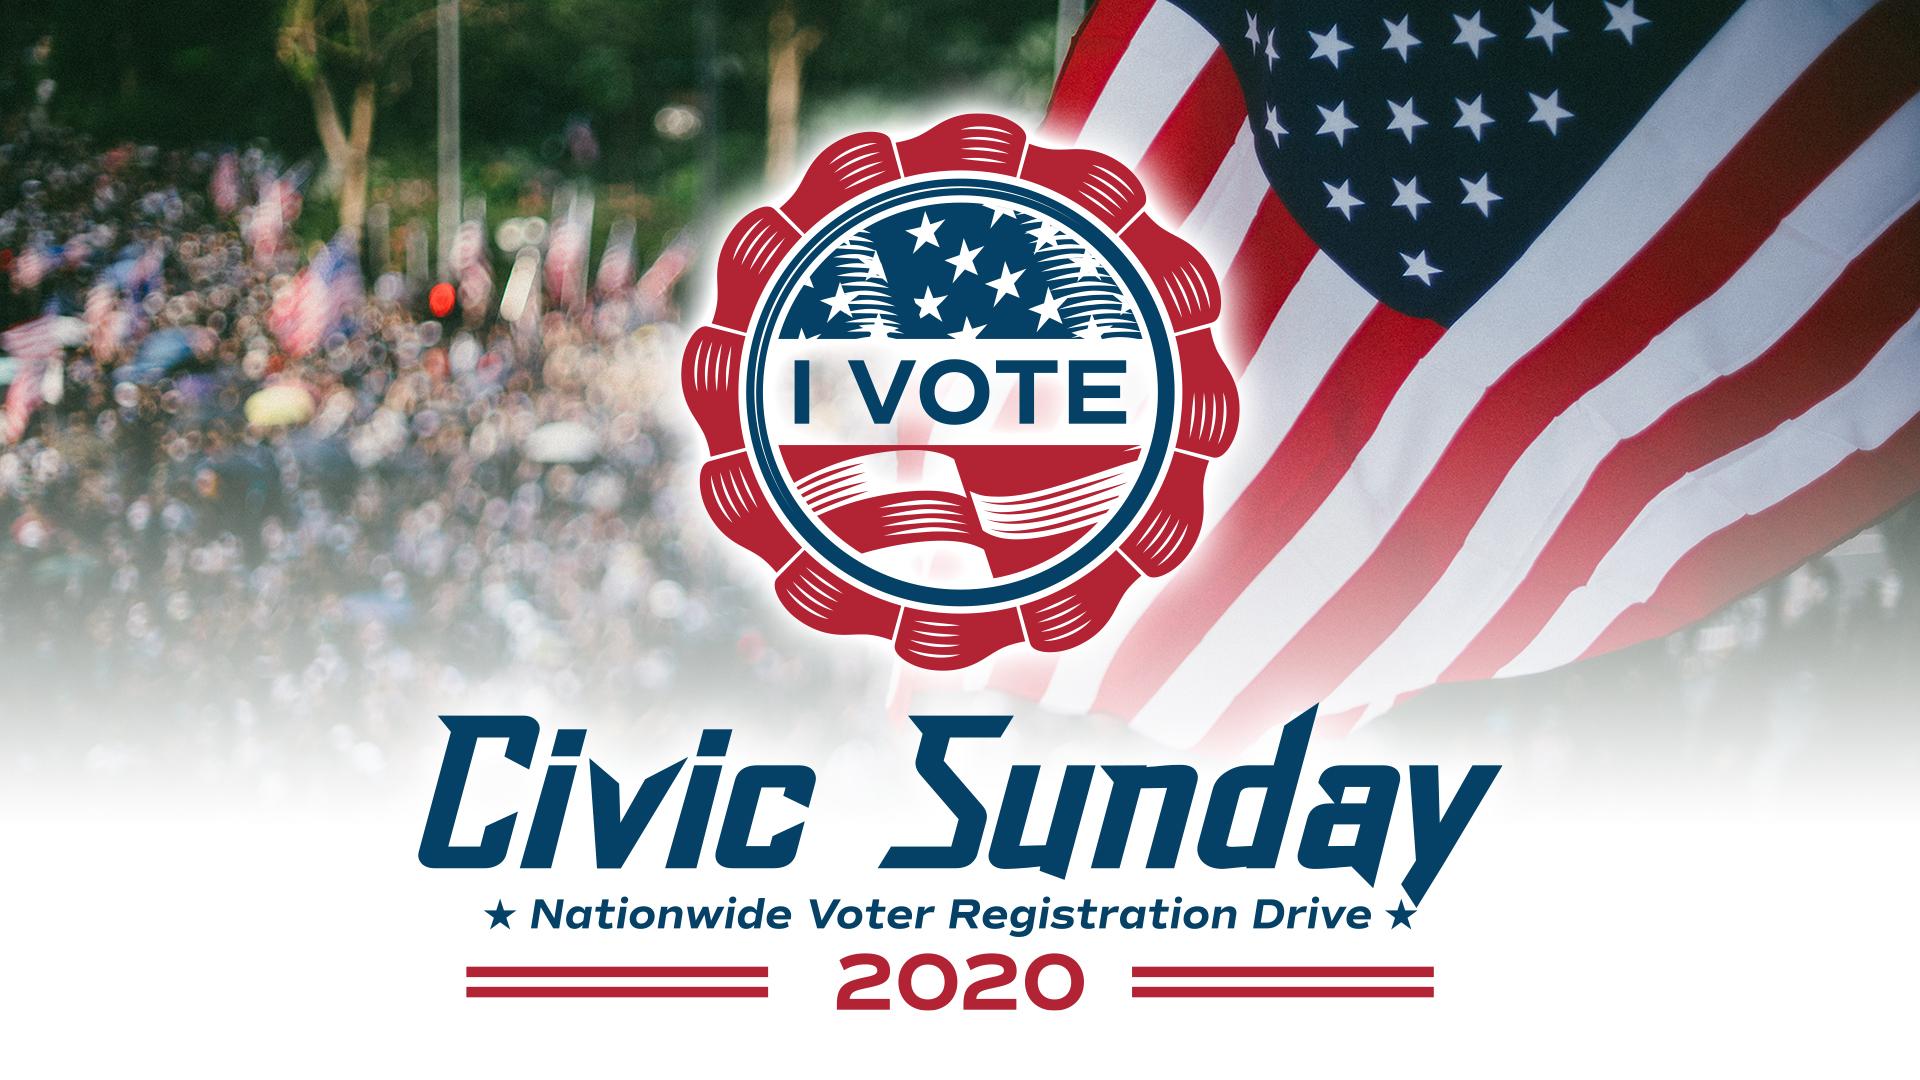 Civic-Sunday-1920x1080-2020